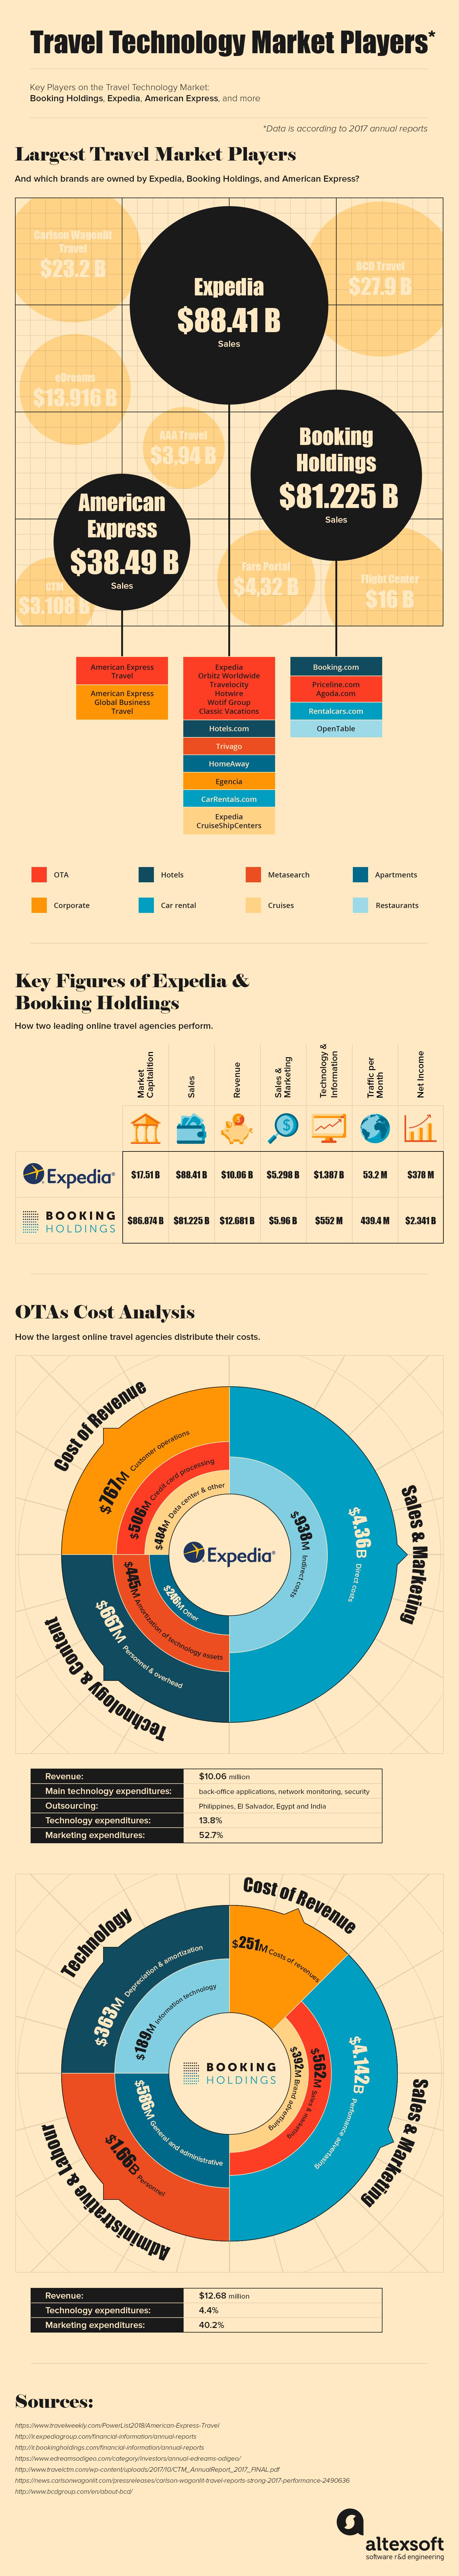 key travel technology market players